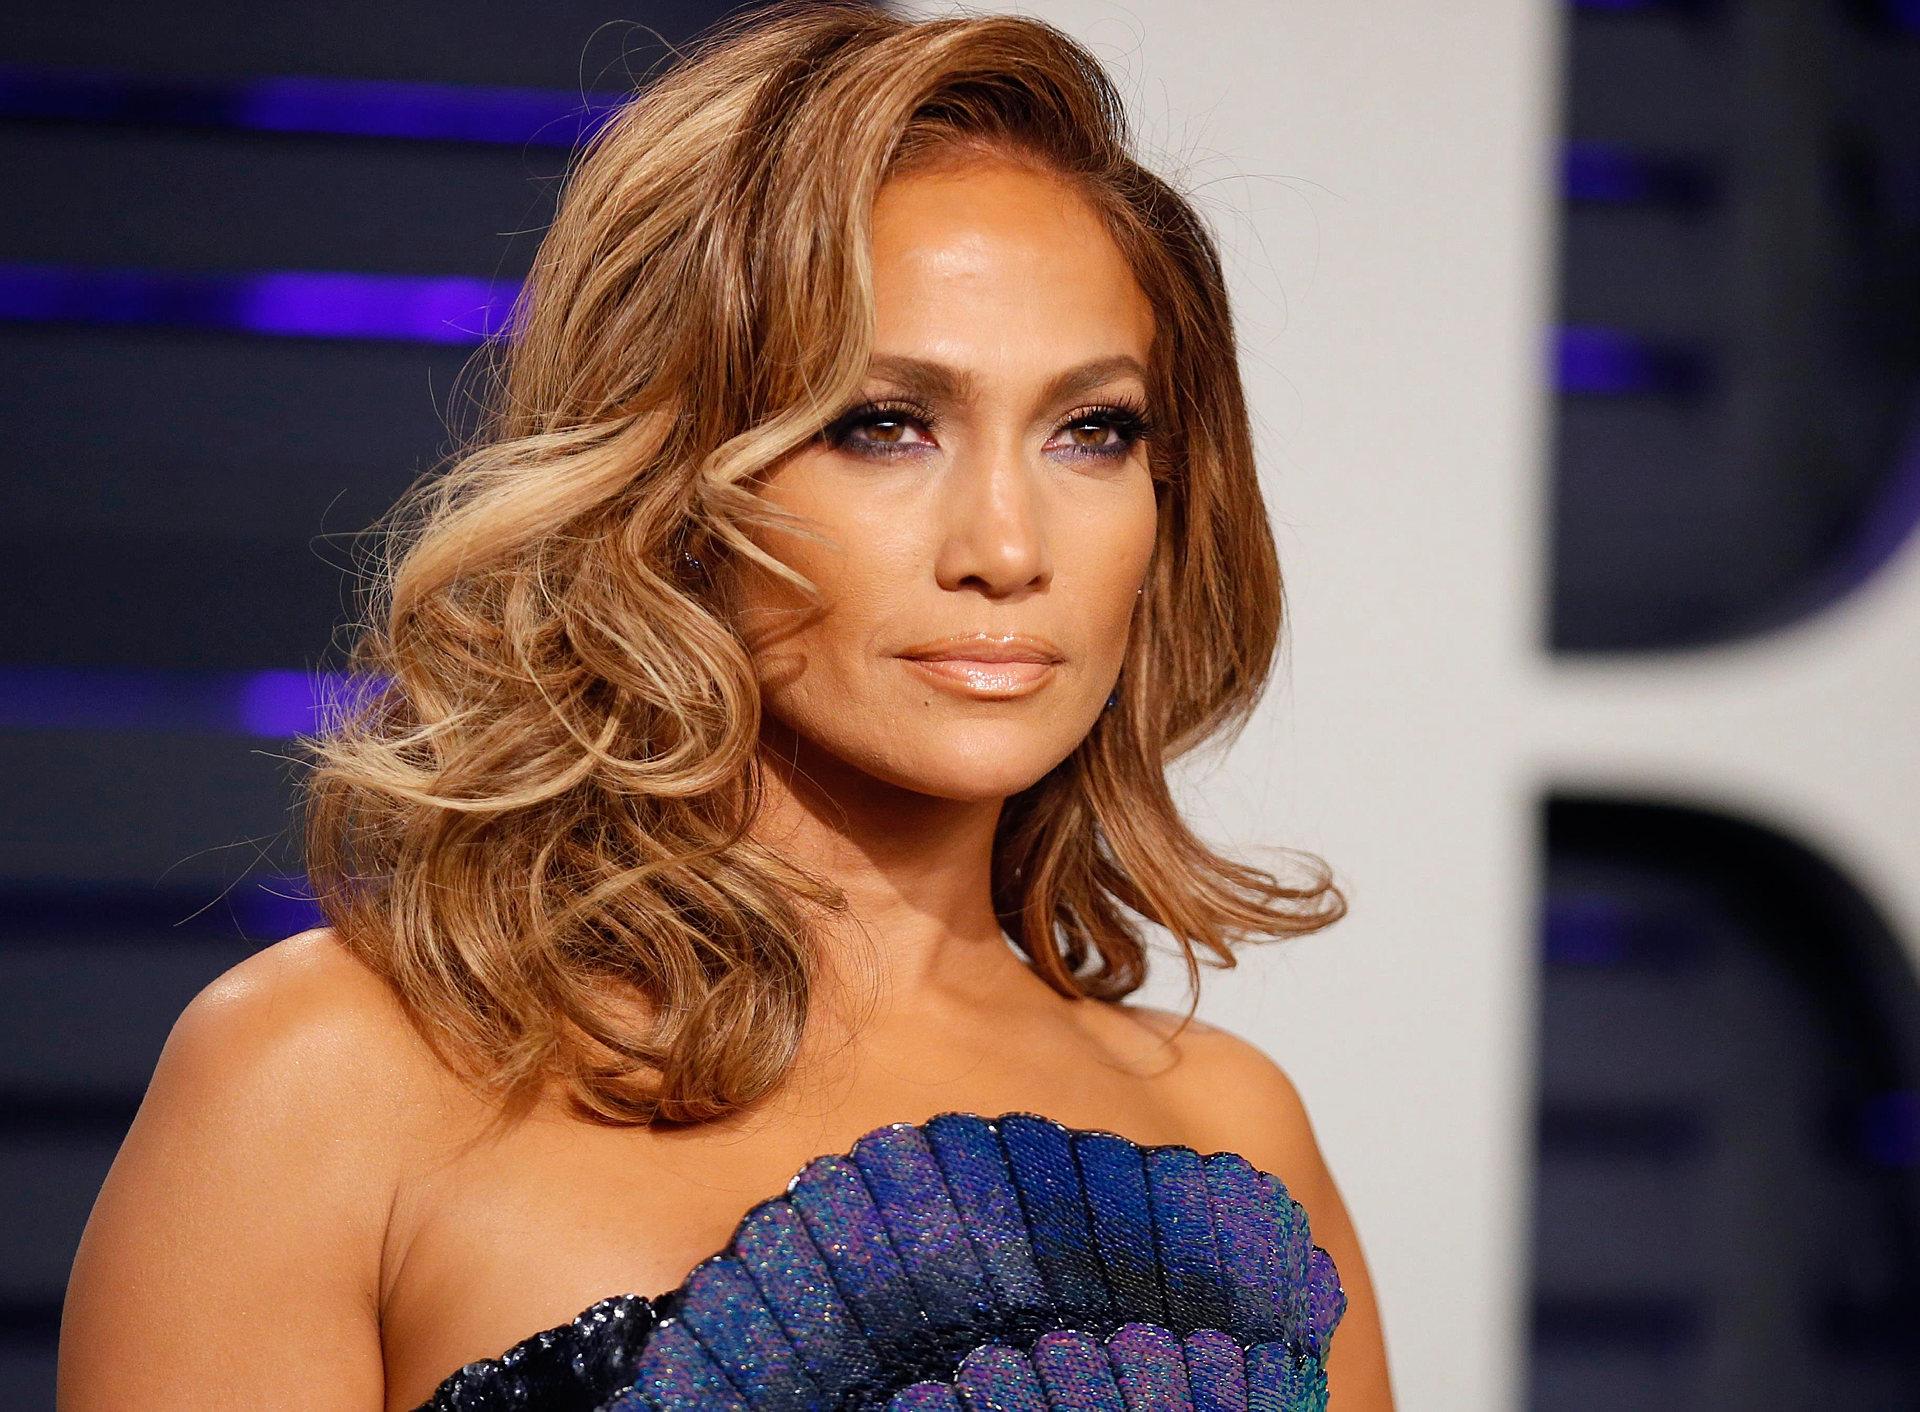 Jennifer Lopez Just Did a Very Public Fashion Faux Pas in Venice